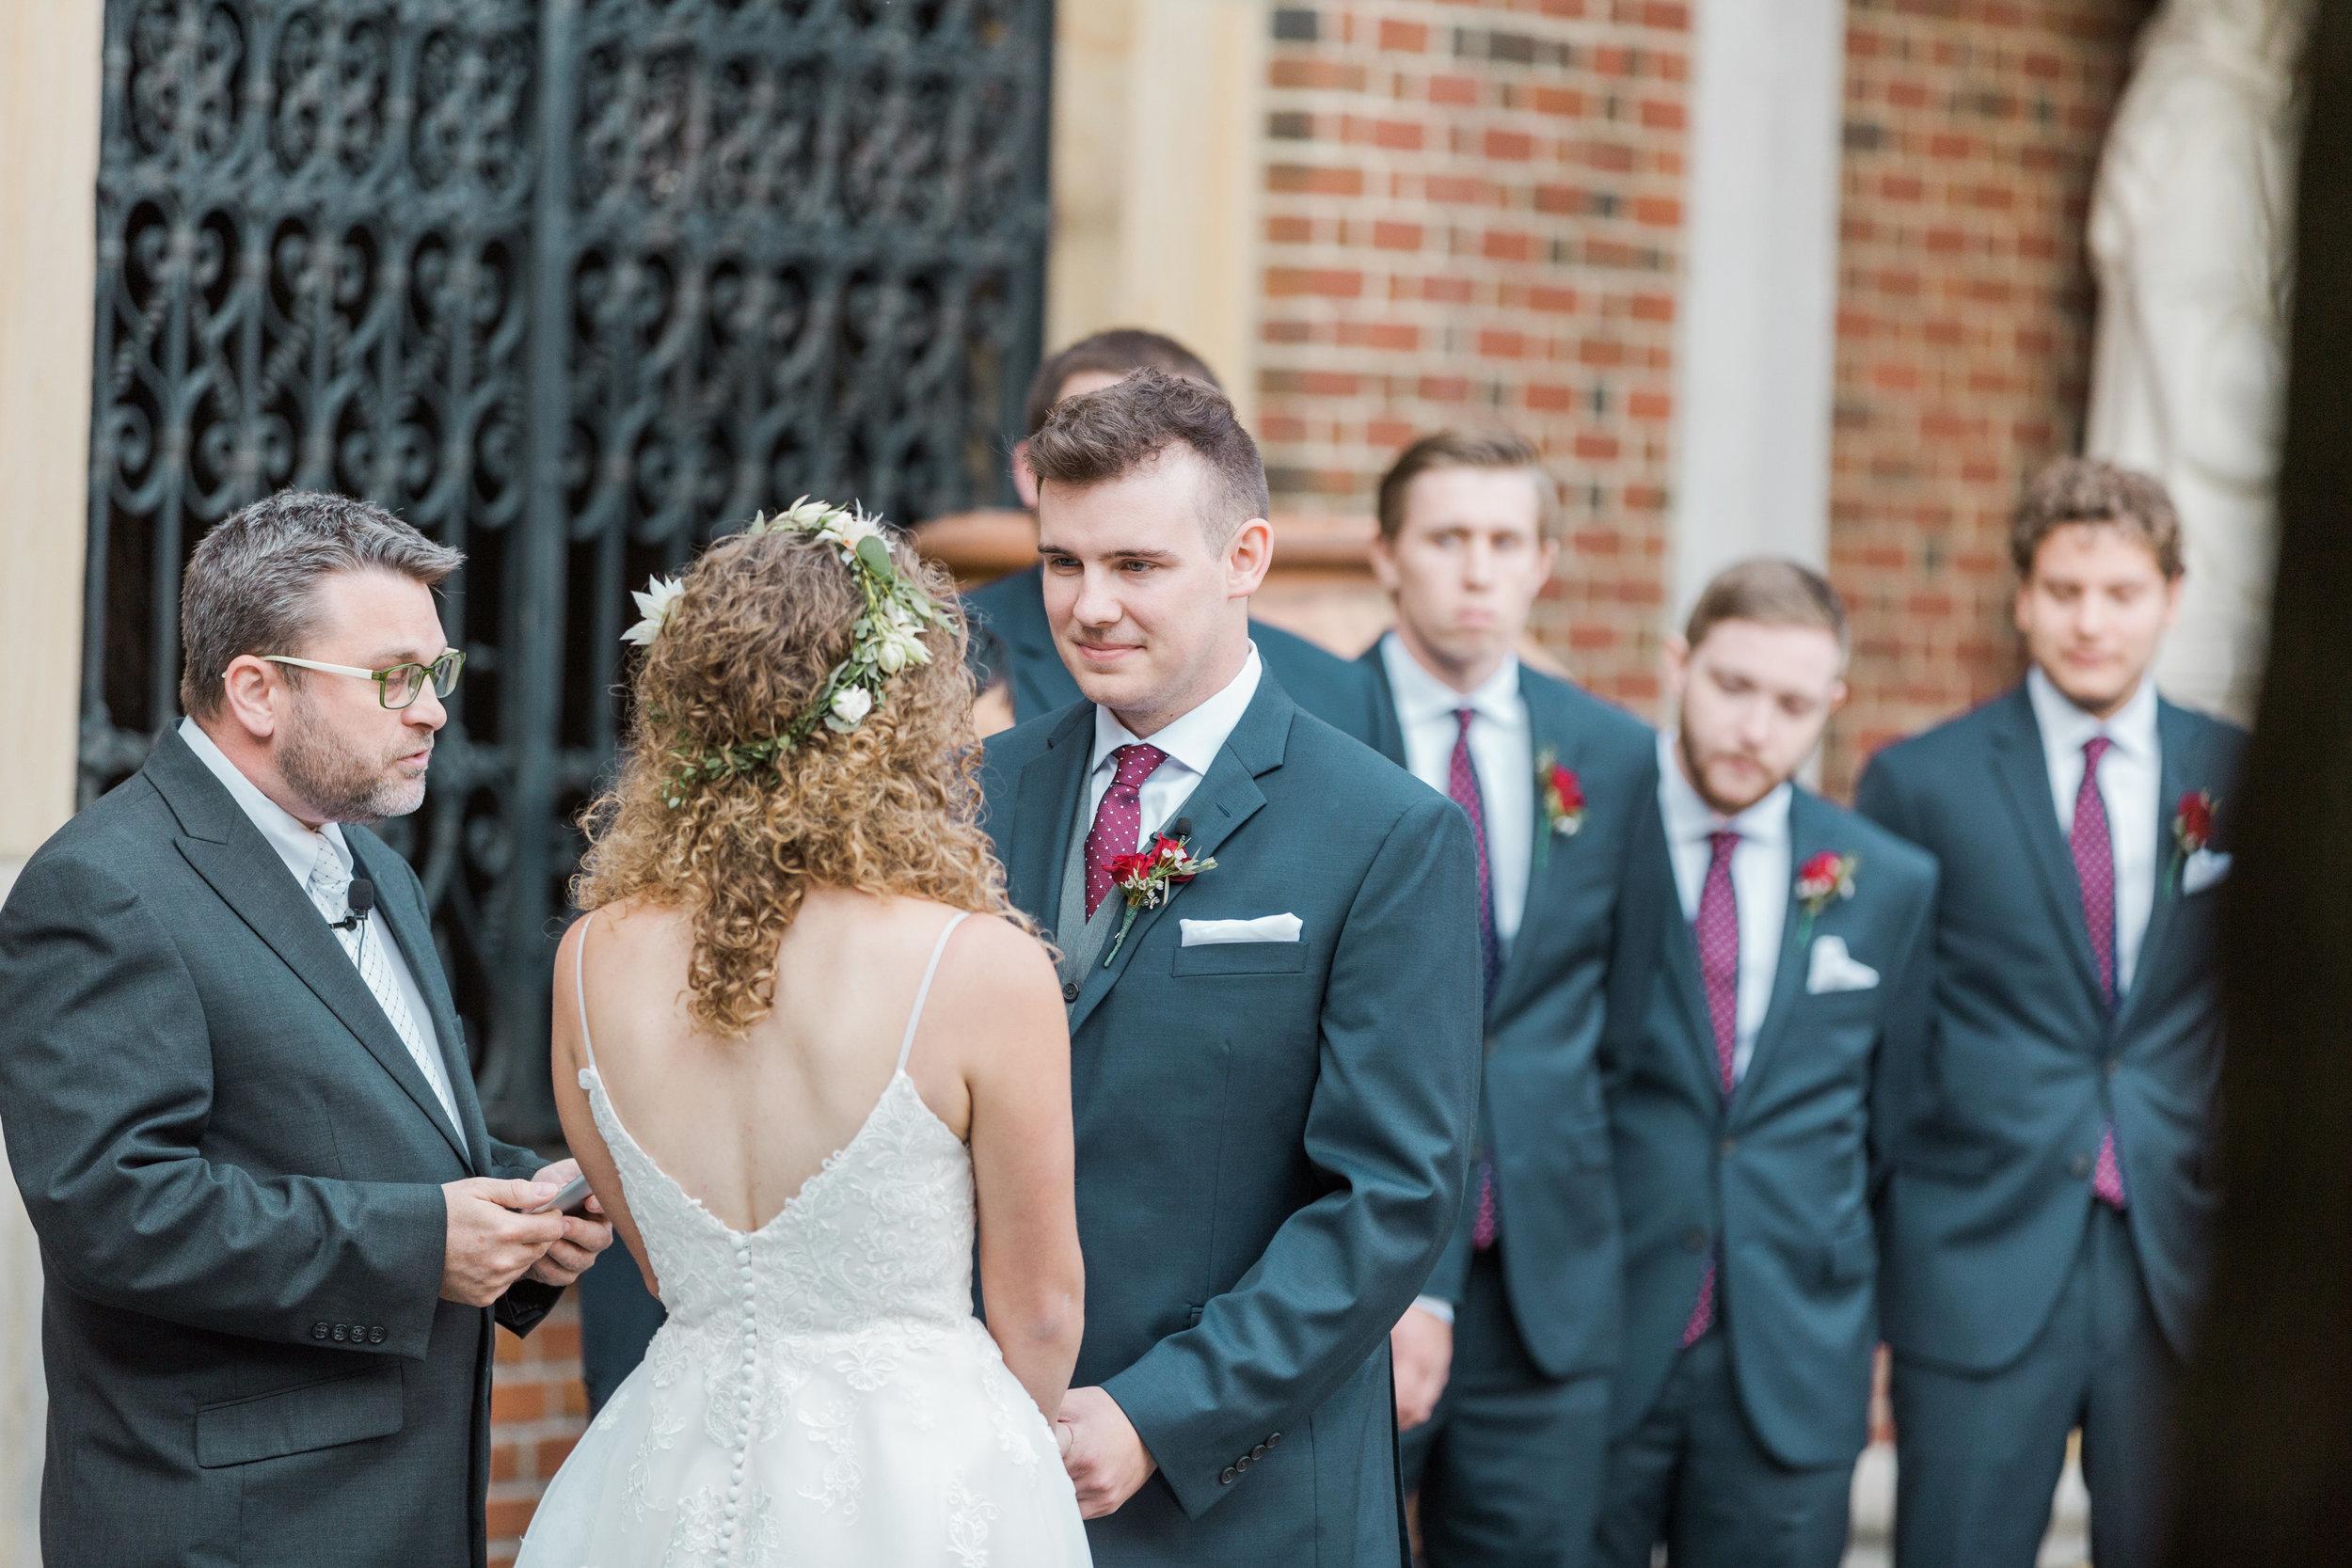 Bales Wedding Gallery-Ceremony-0108.jpg